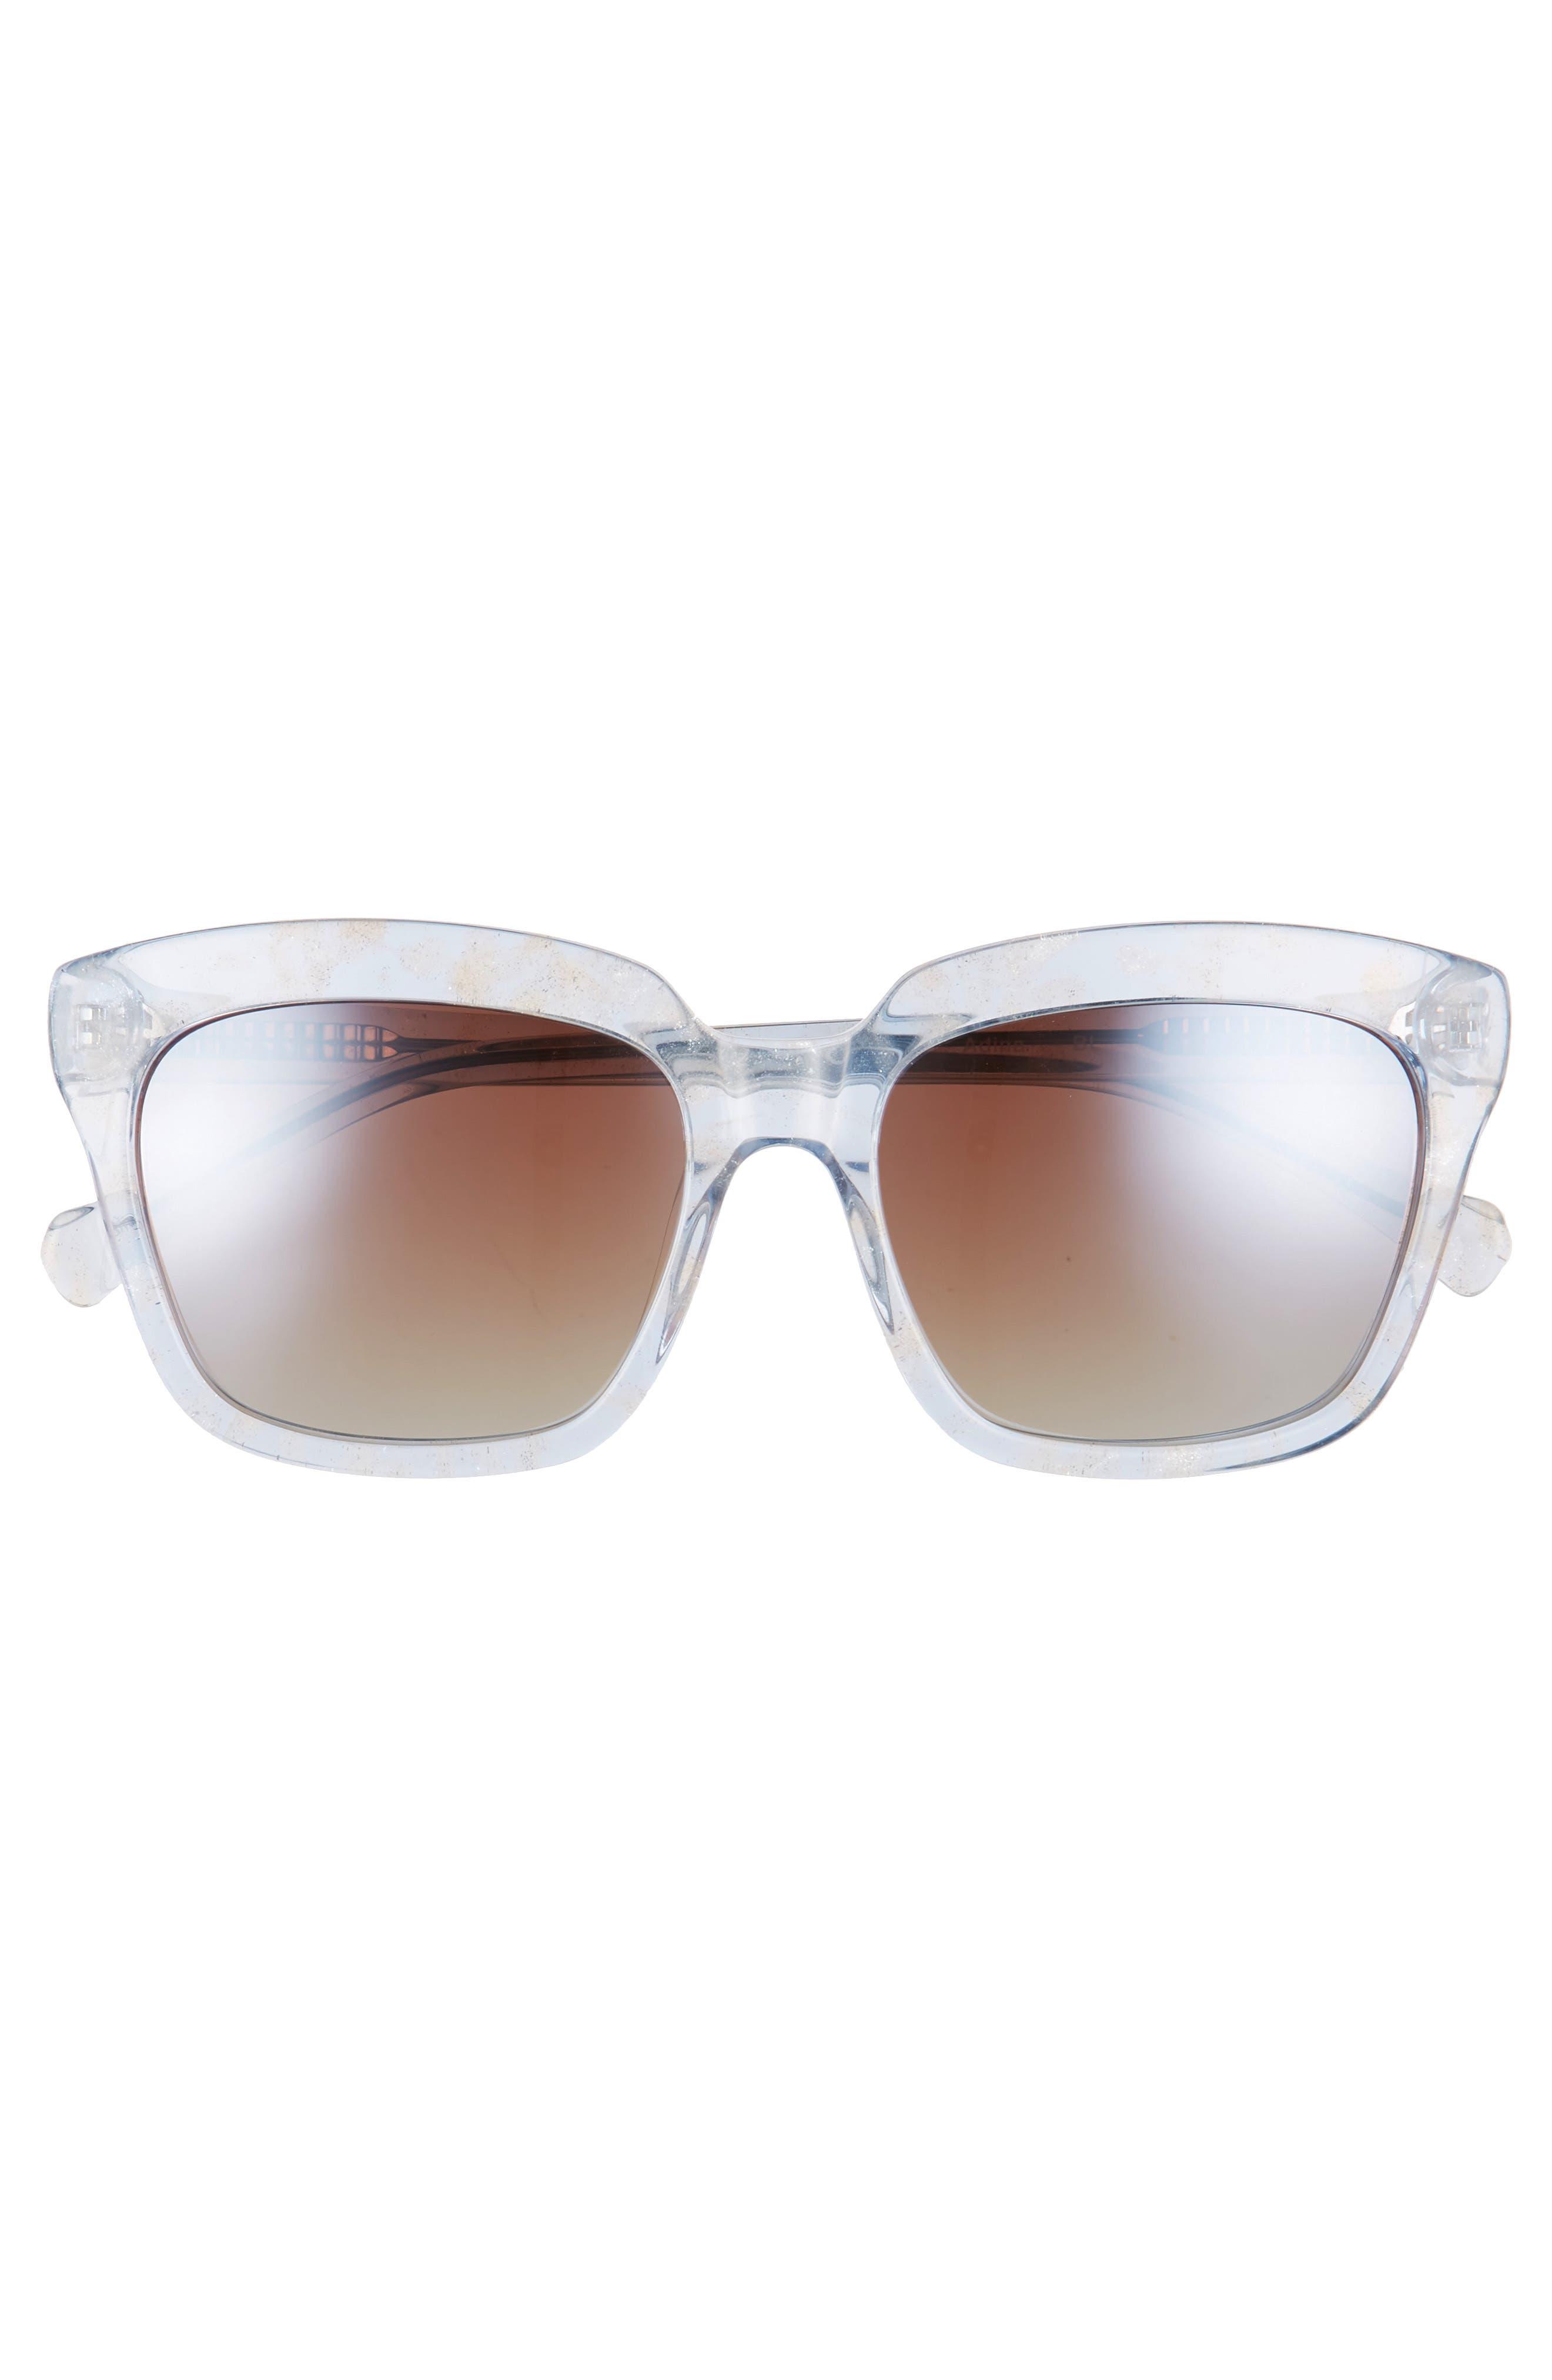 Adina 56mm Polarized Sunglasses,                             Alternate thumbnail 3, color,                             Blue Polar/ Greige